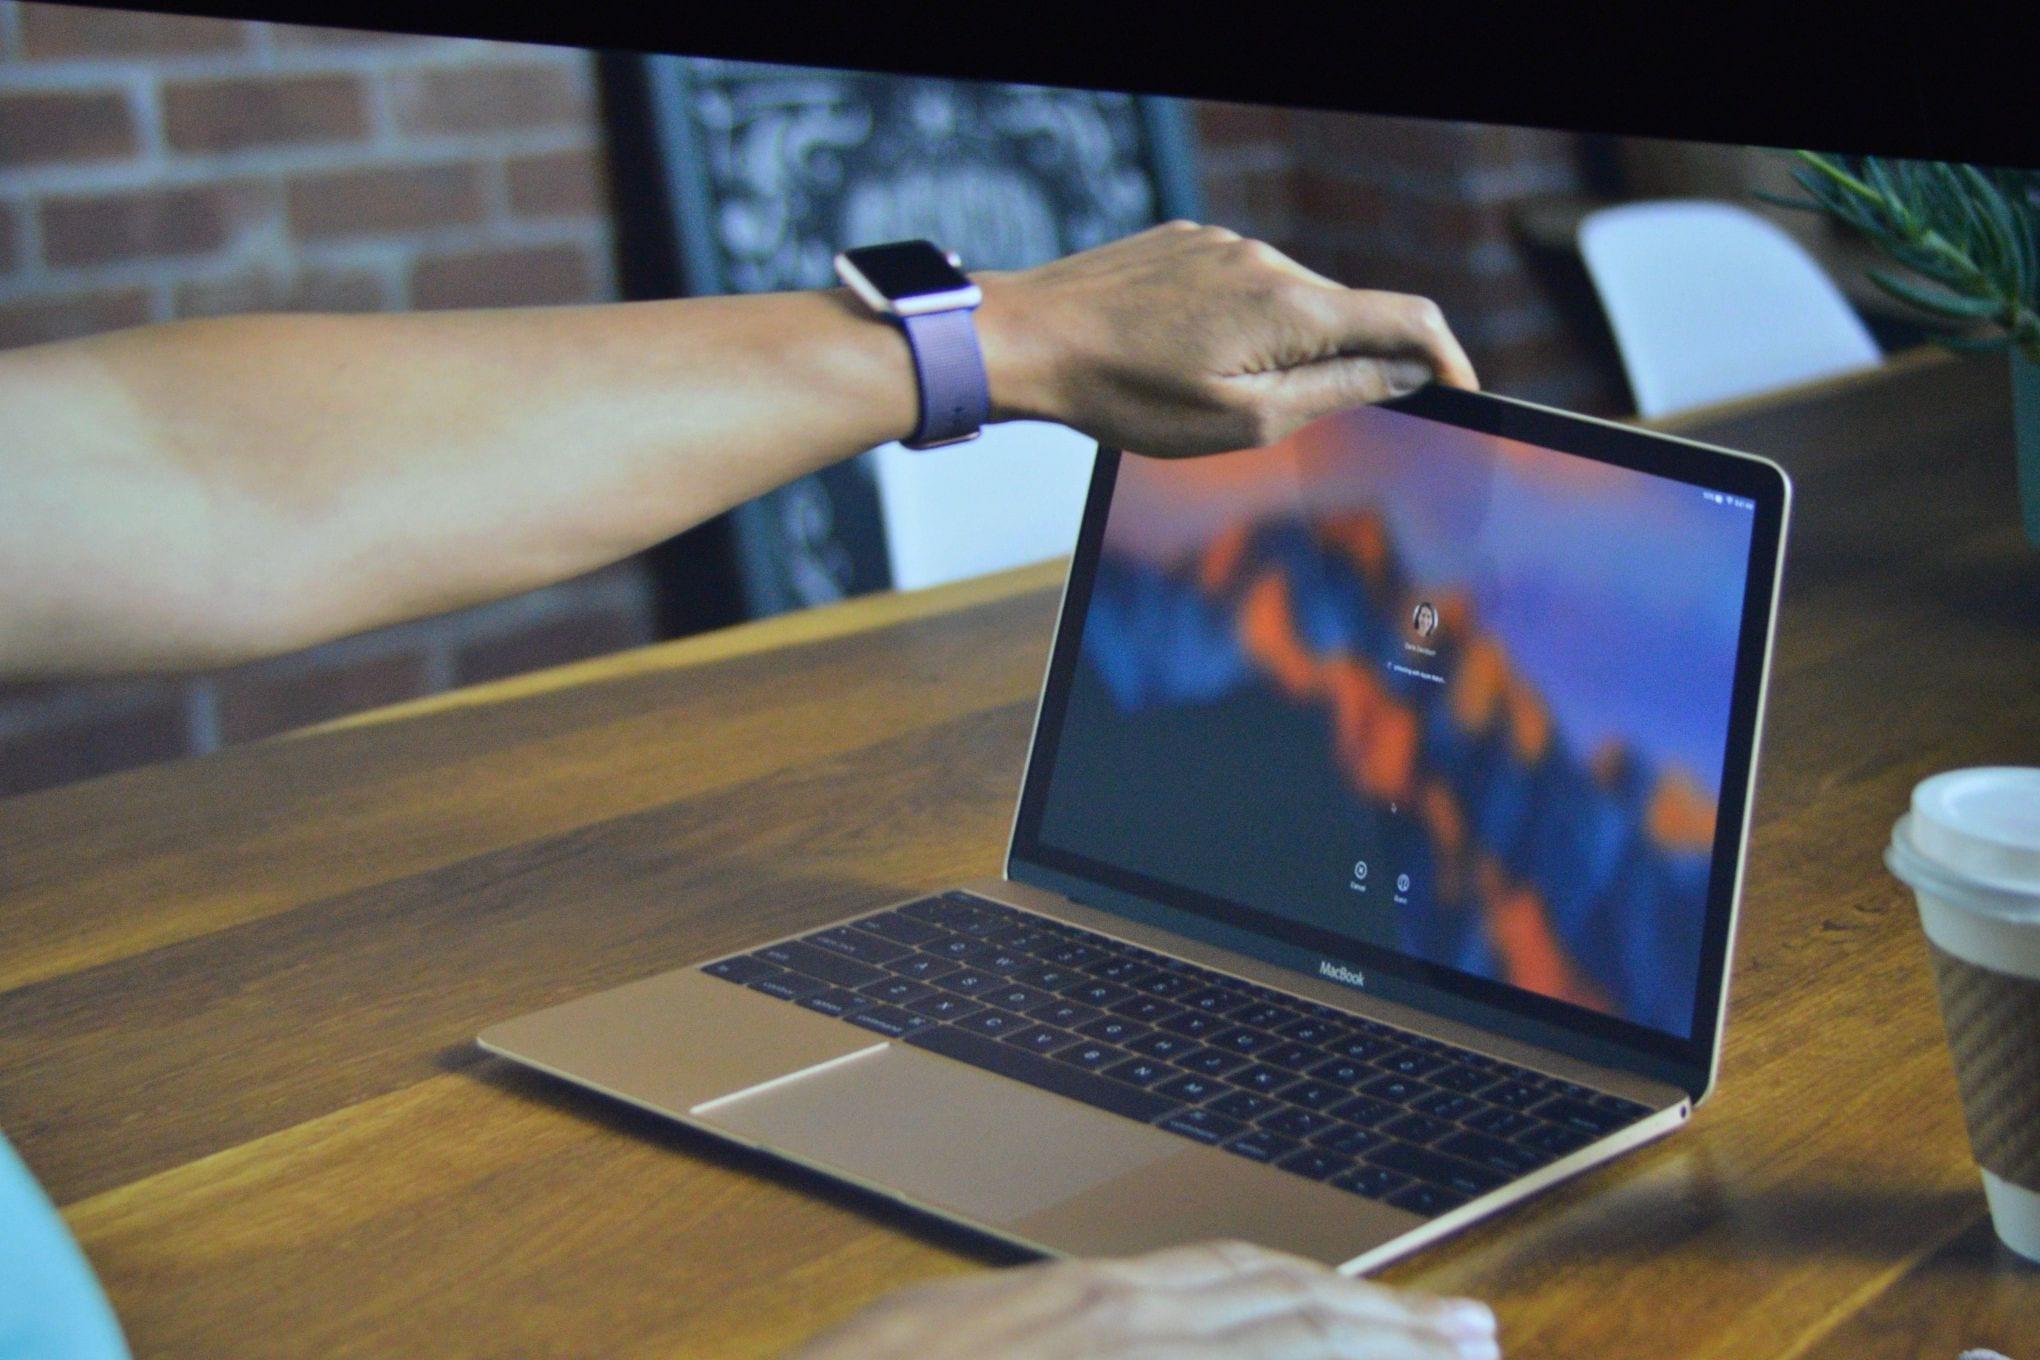 Wwdc 2016 Apple Predstavil Macos Sierra S Podporou Siri